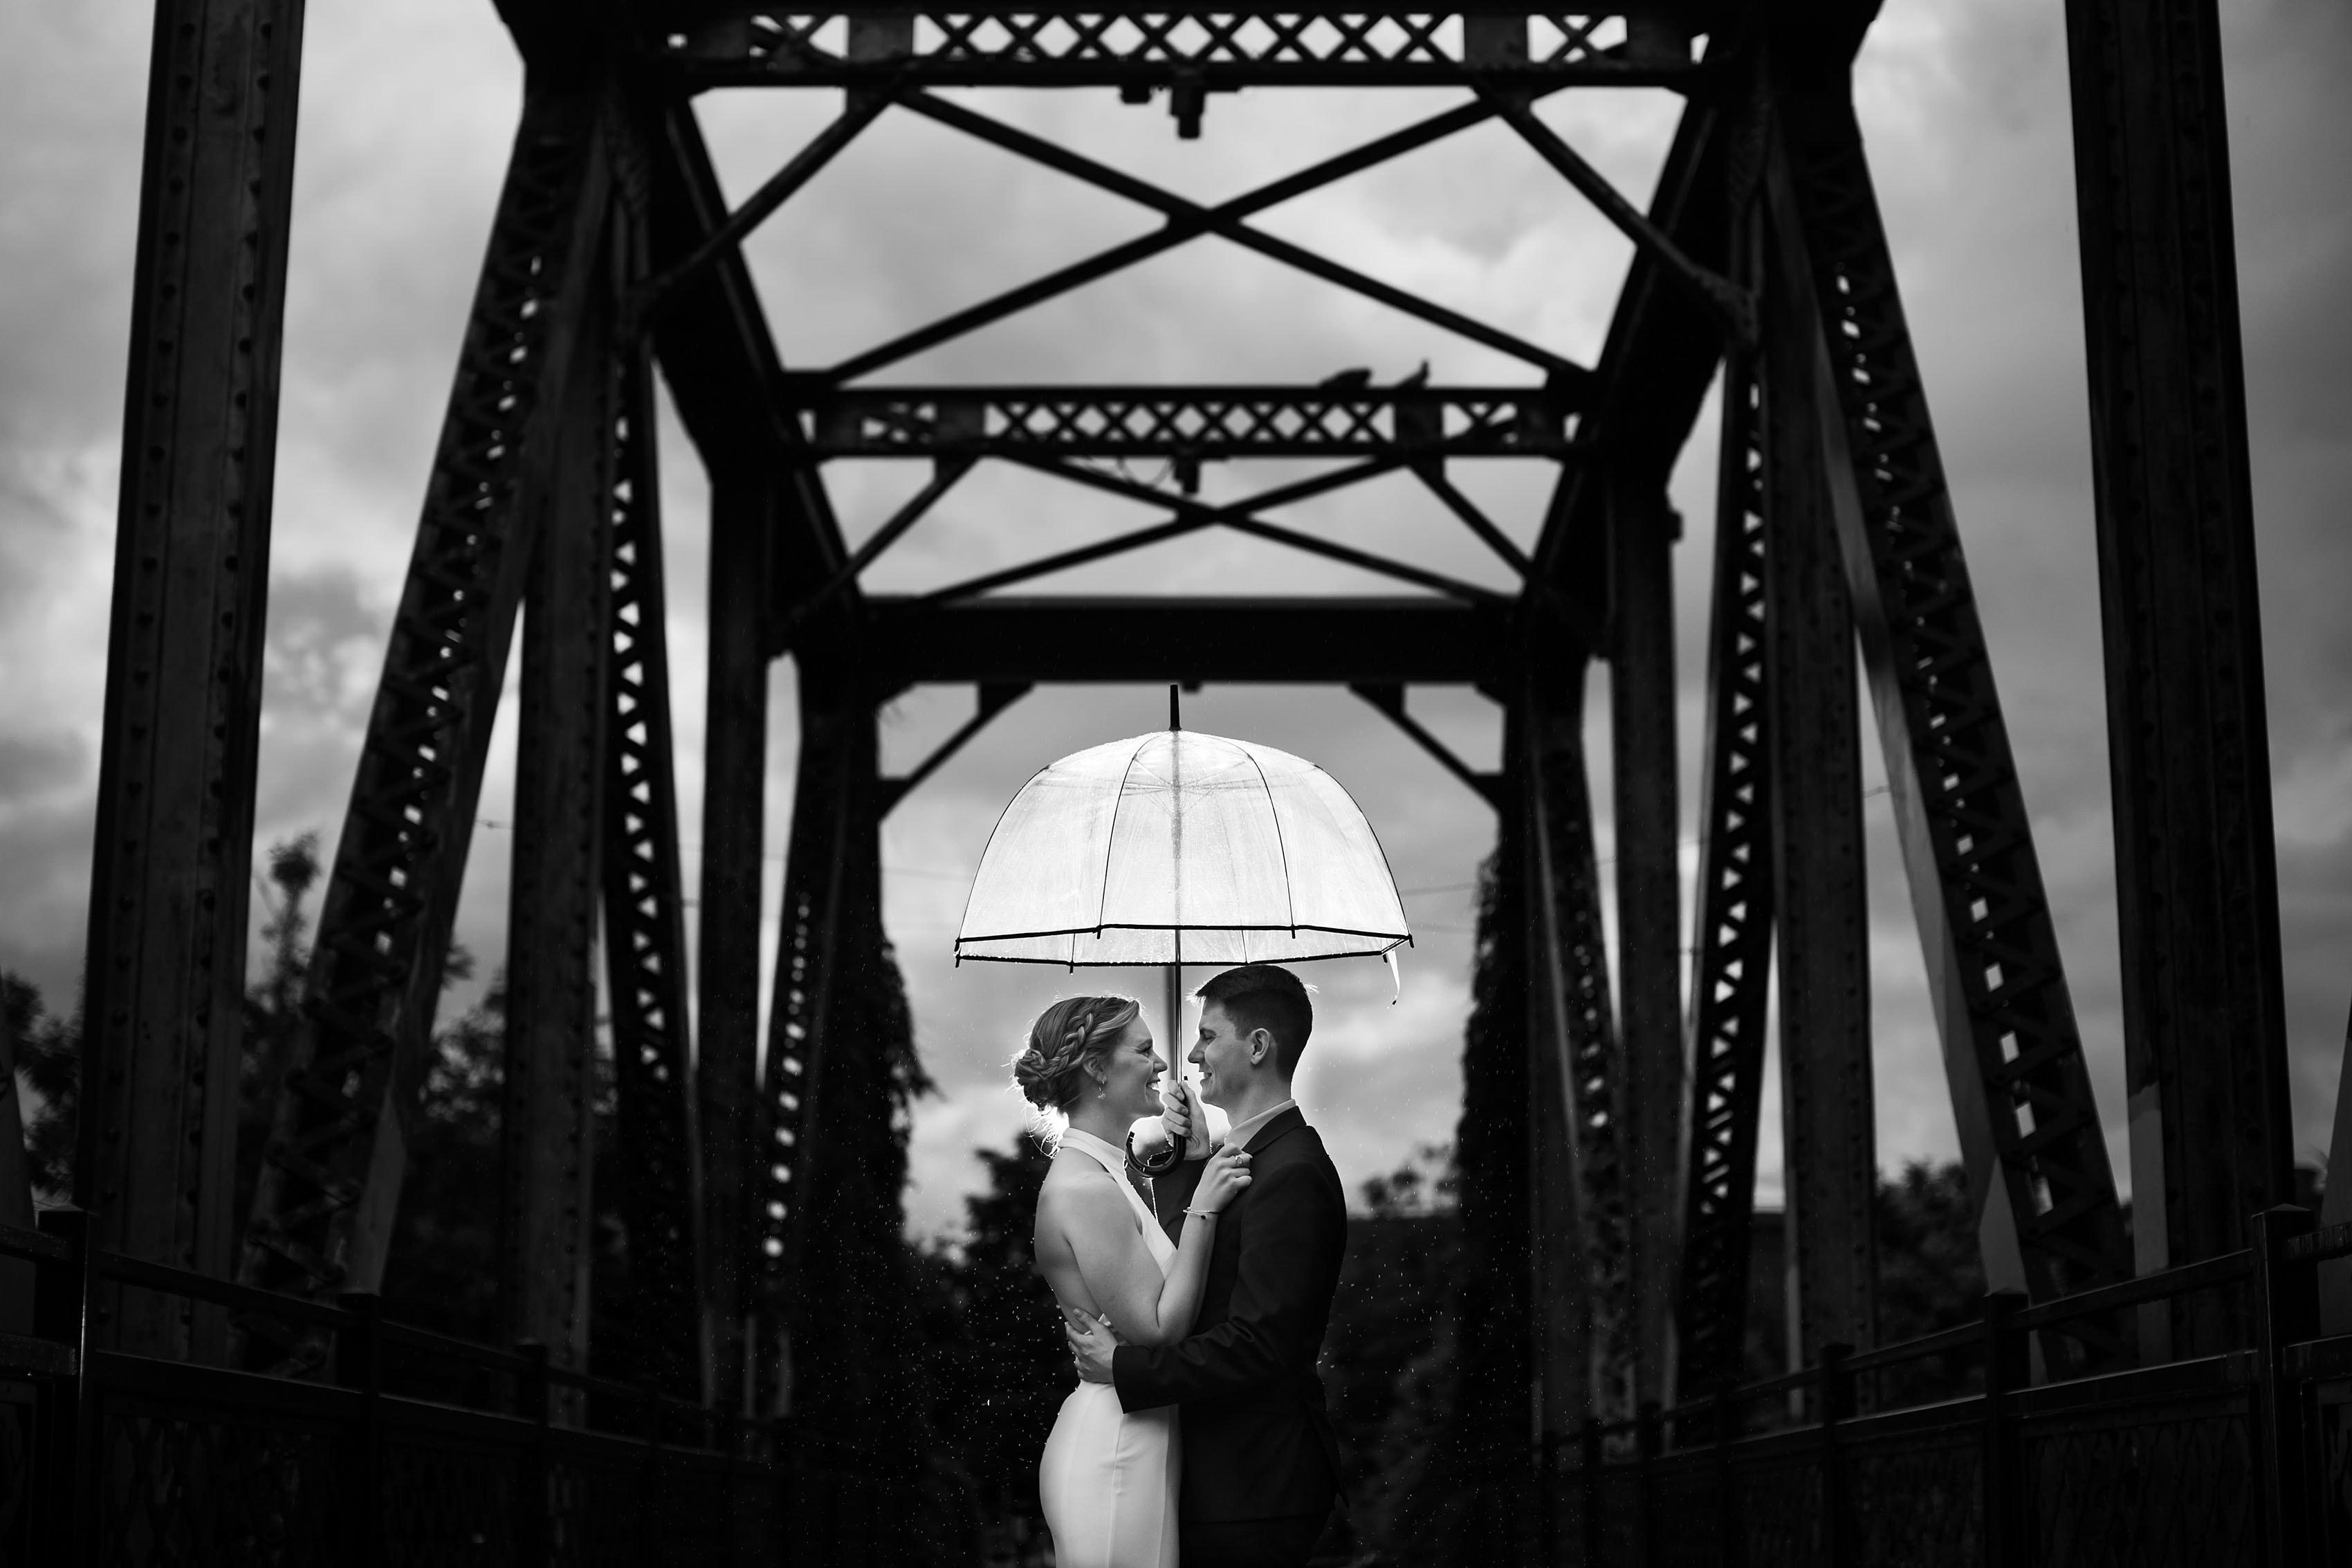 Wynkoop Street Bridge wedding portrait in the rain with an umbrella